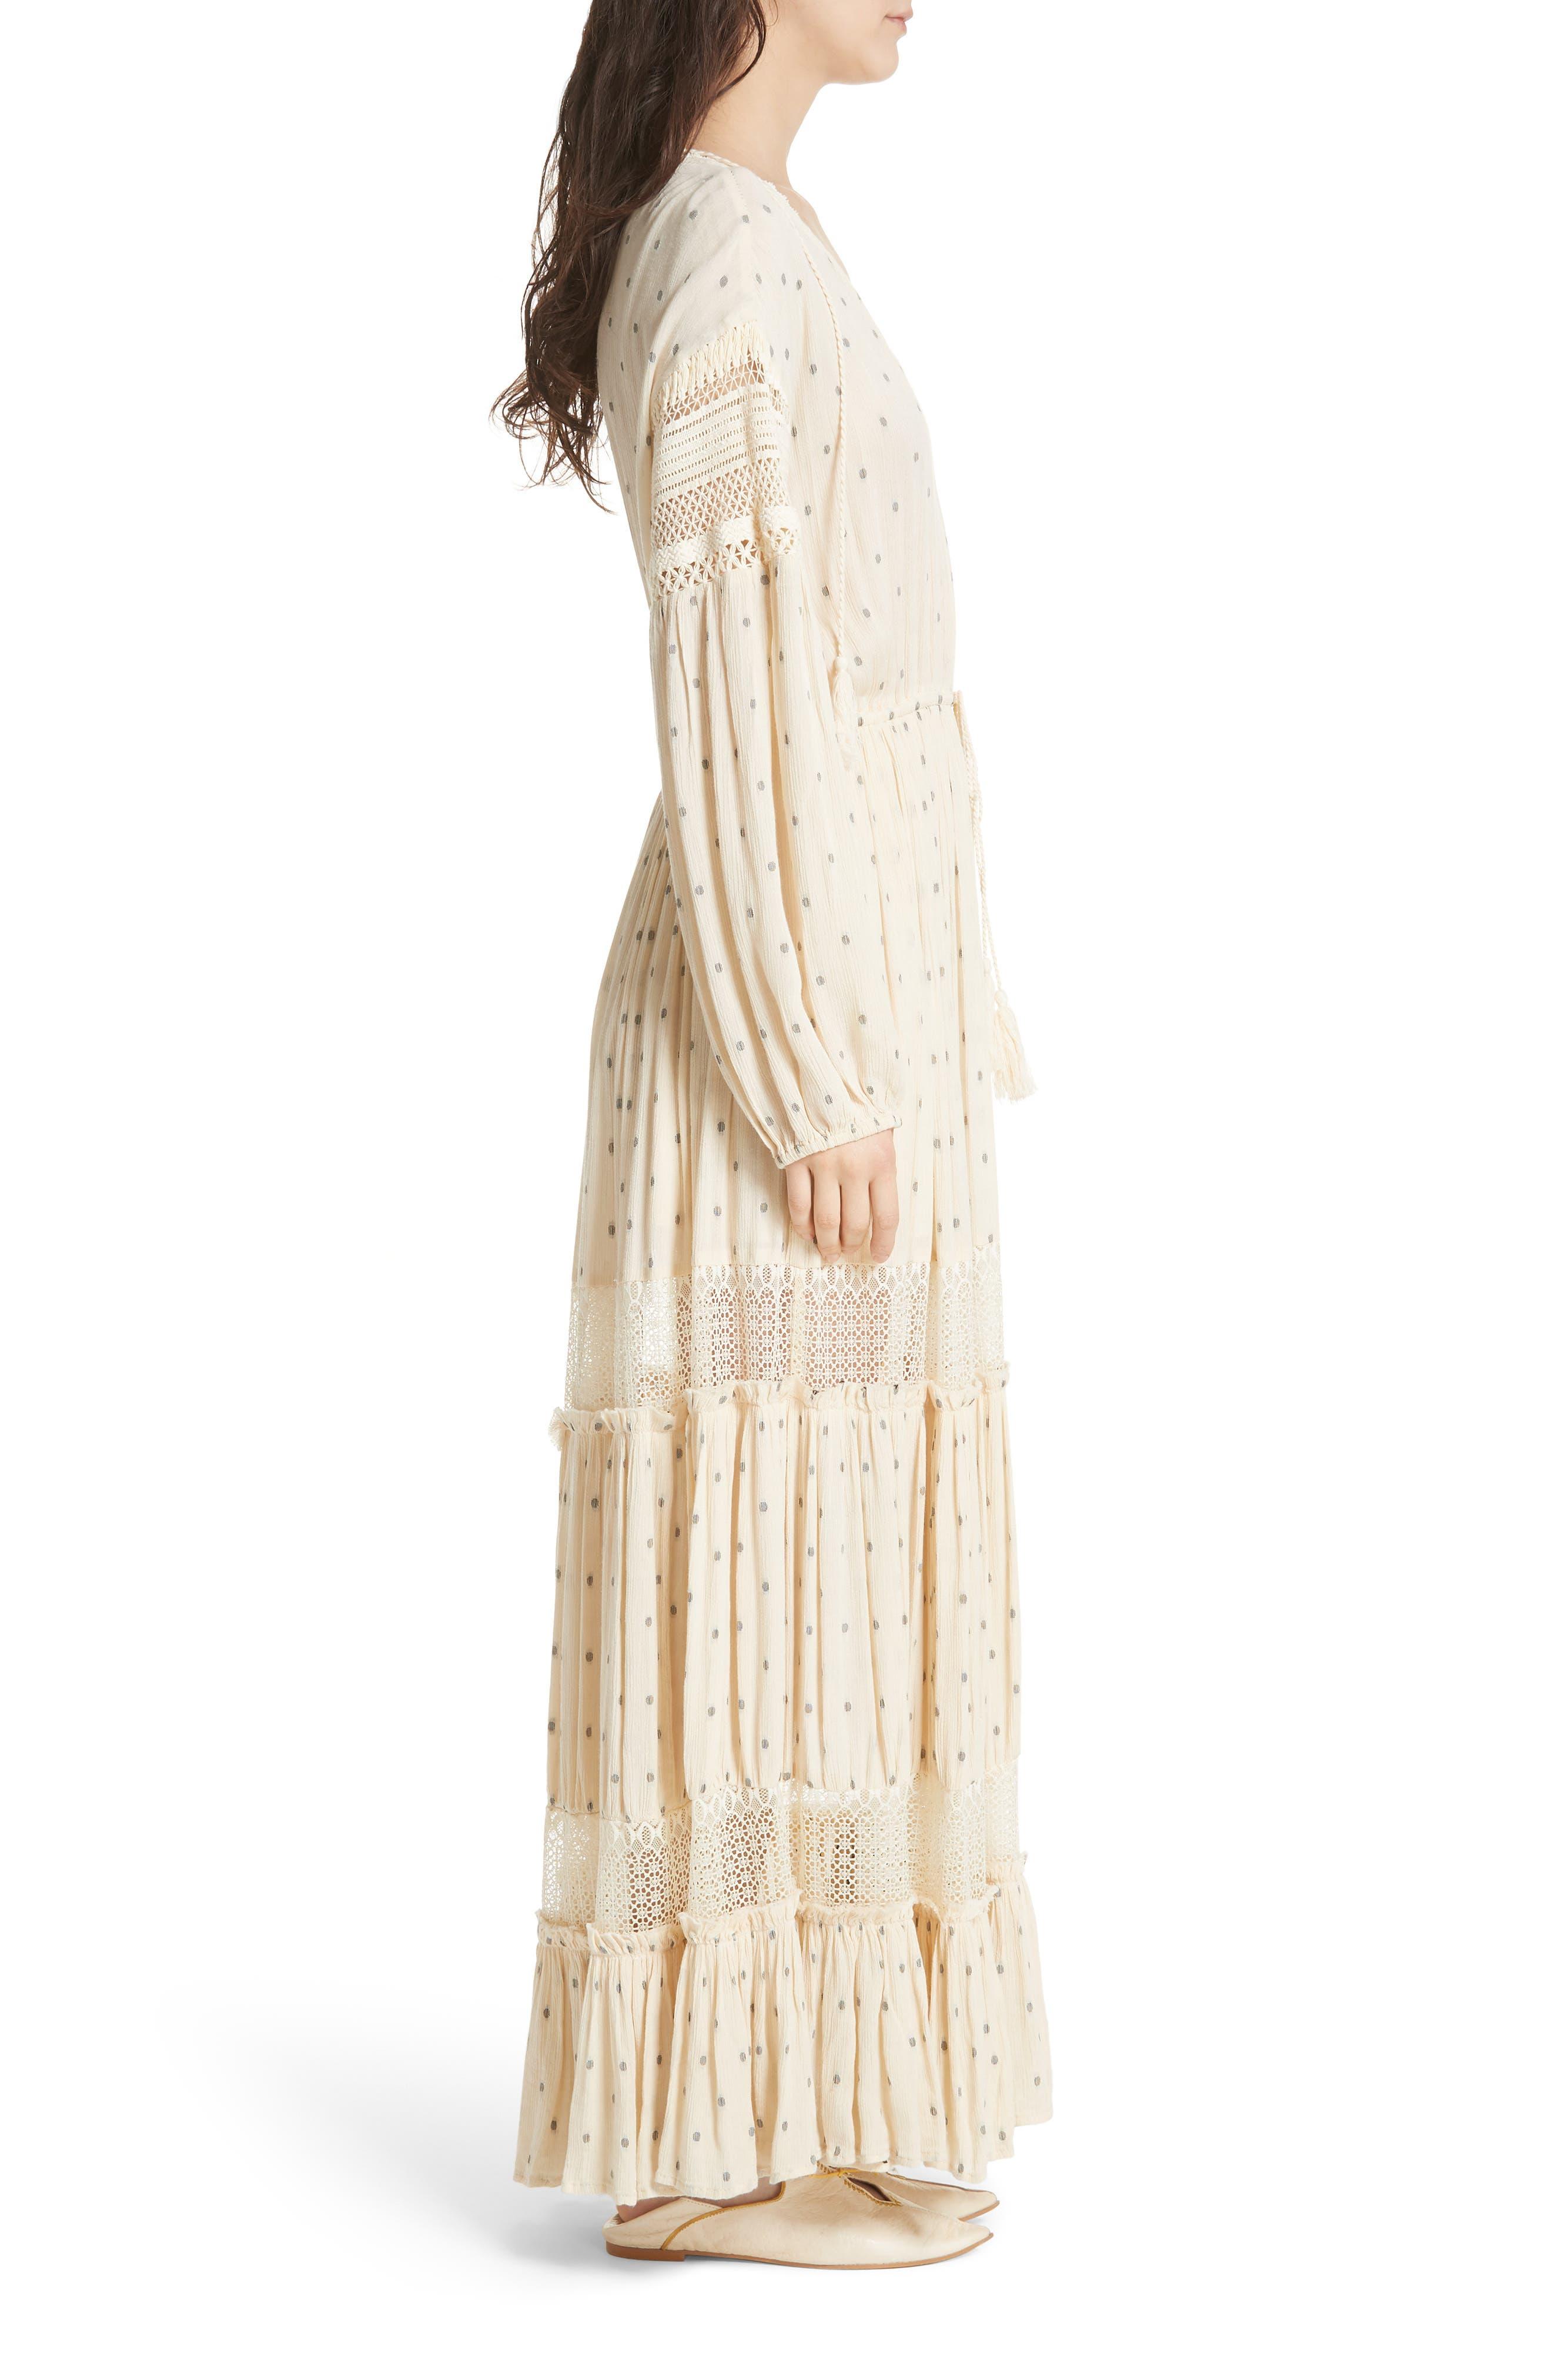 Sada Maxi Dress,                             Alternate thumbnail 3, color,                             903